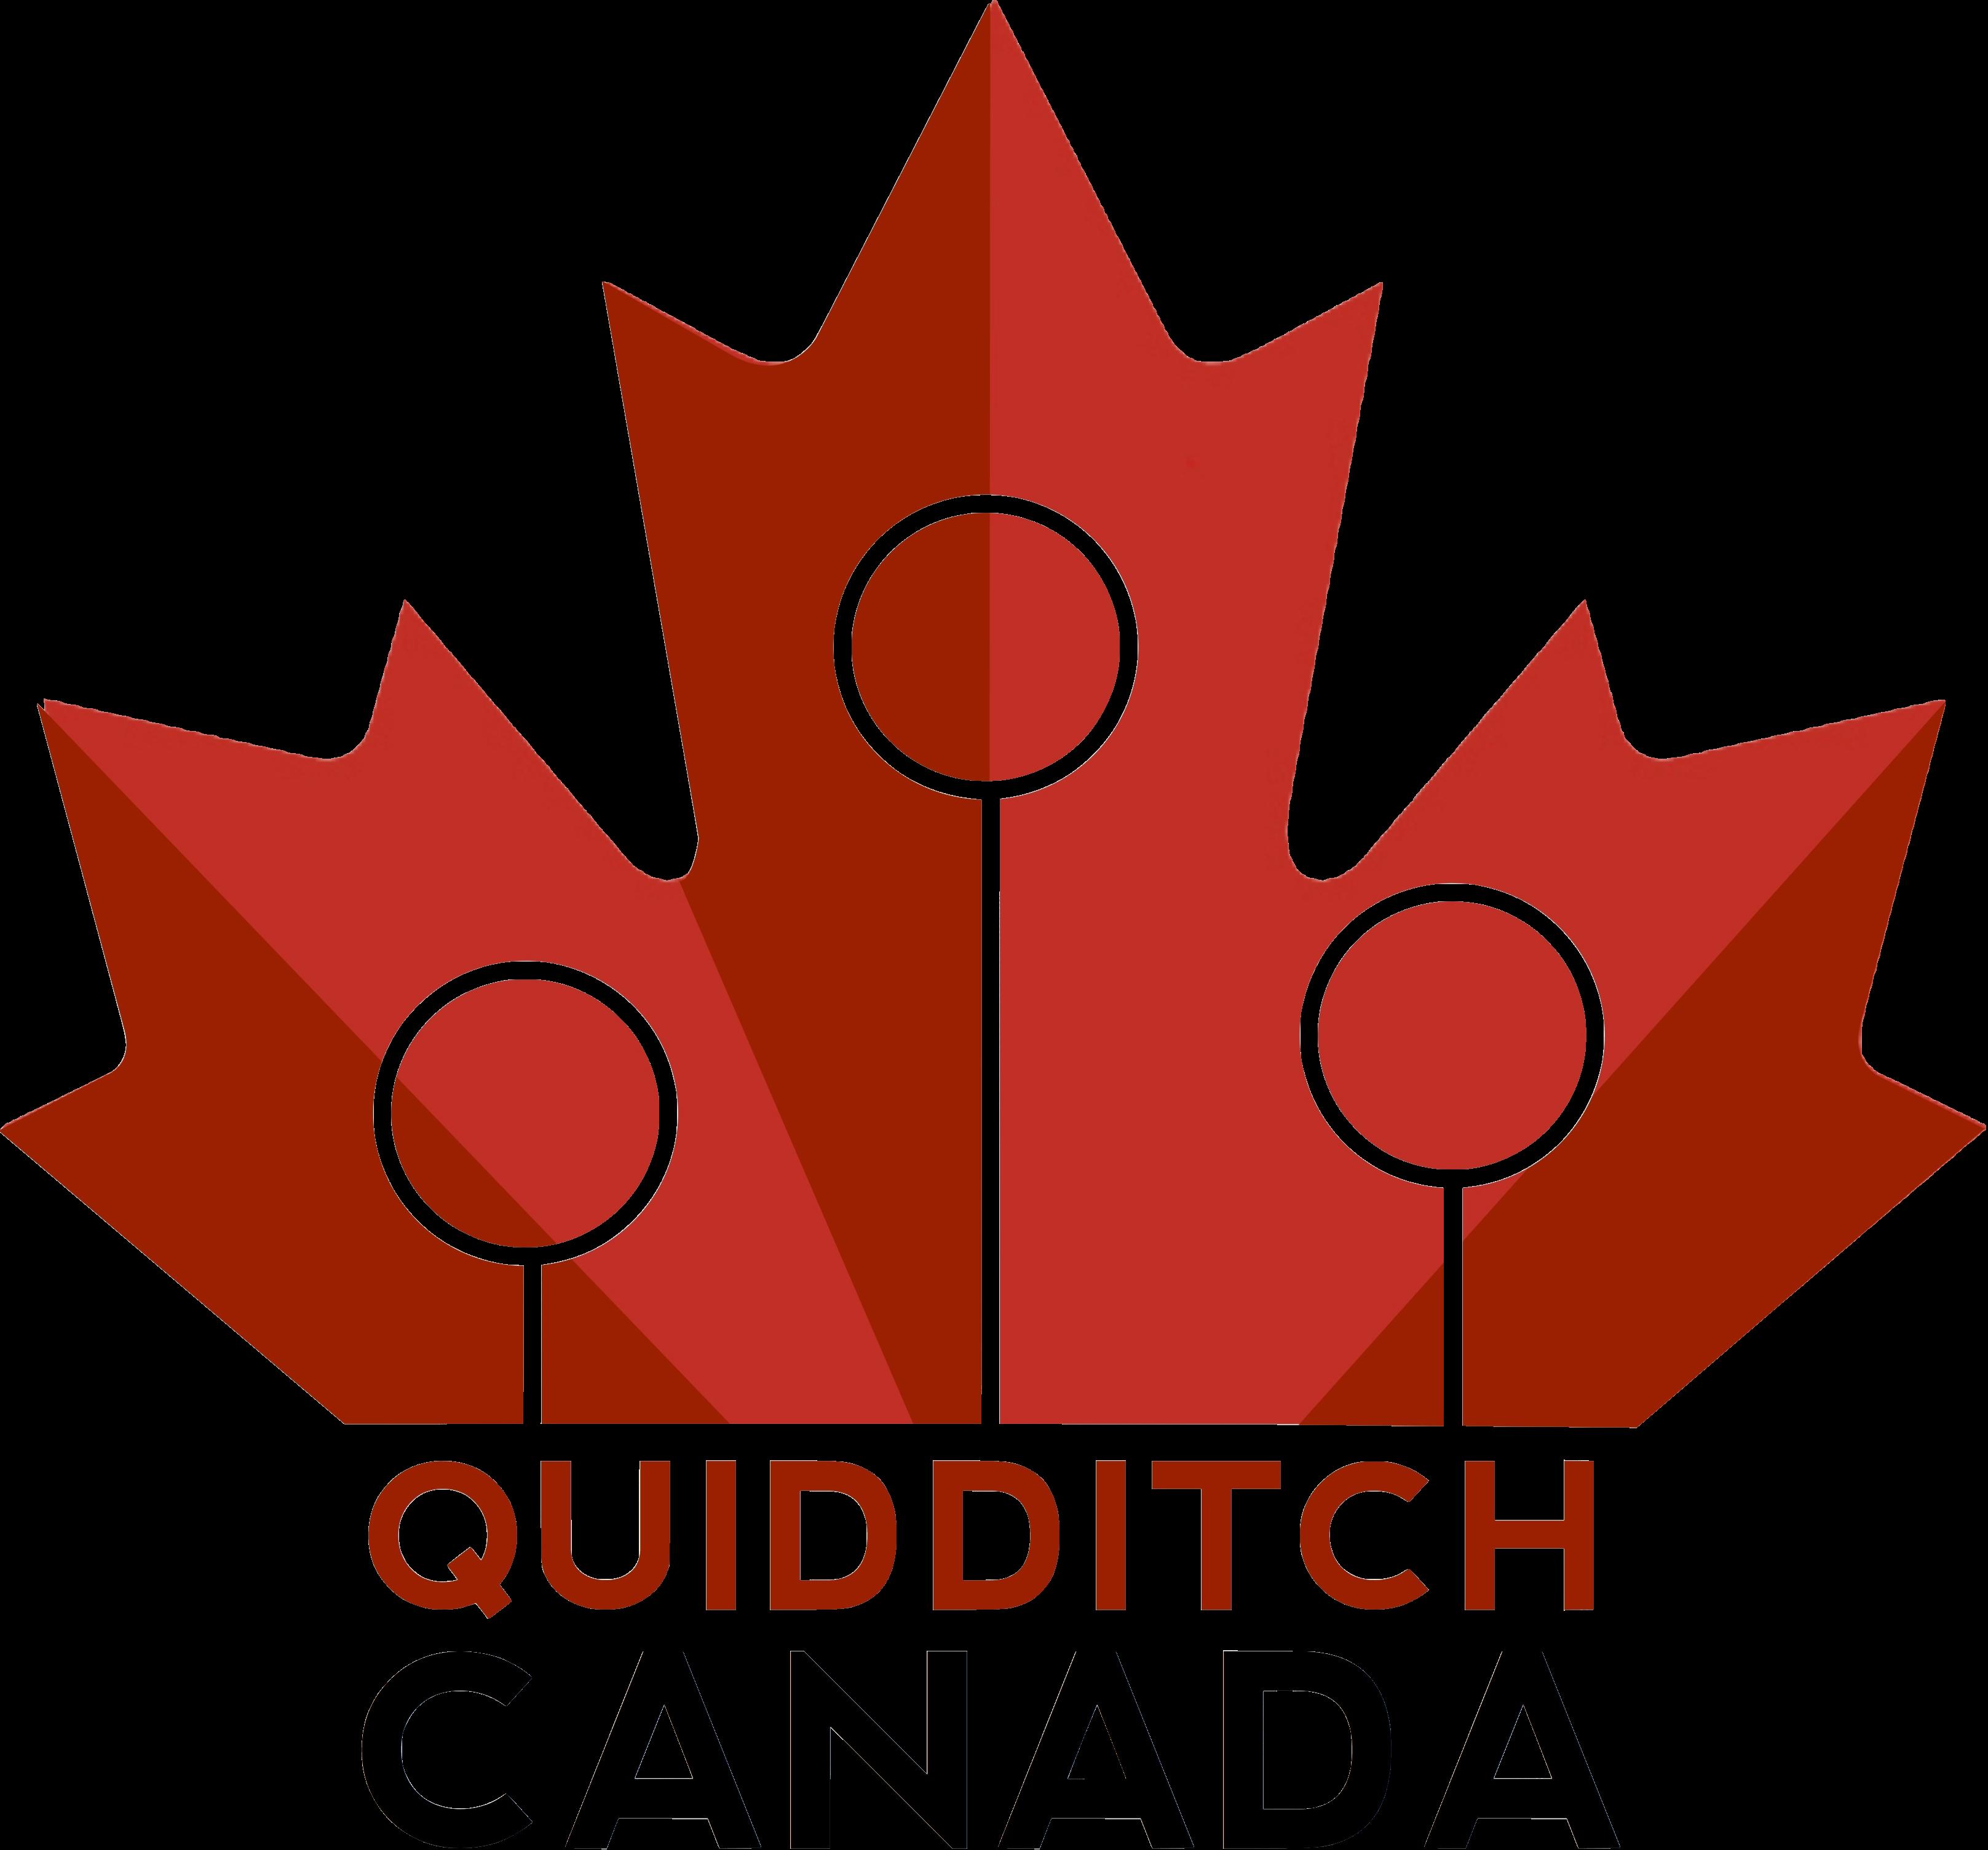 filequidditch canada 2014 logopng wikipedia